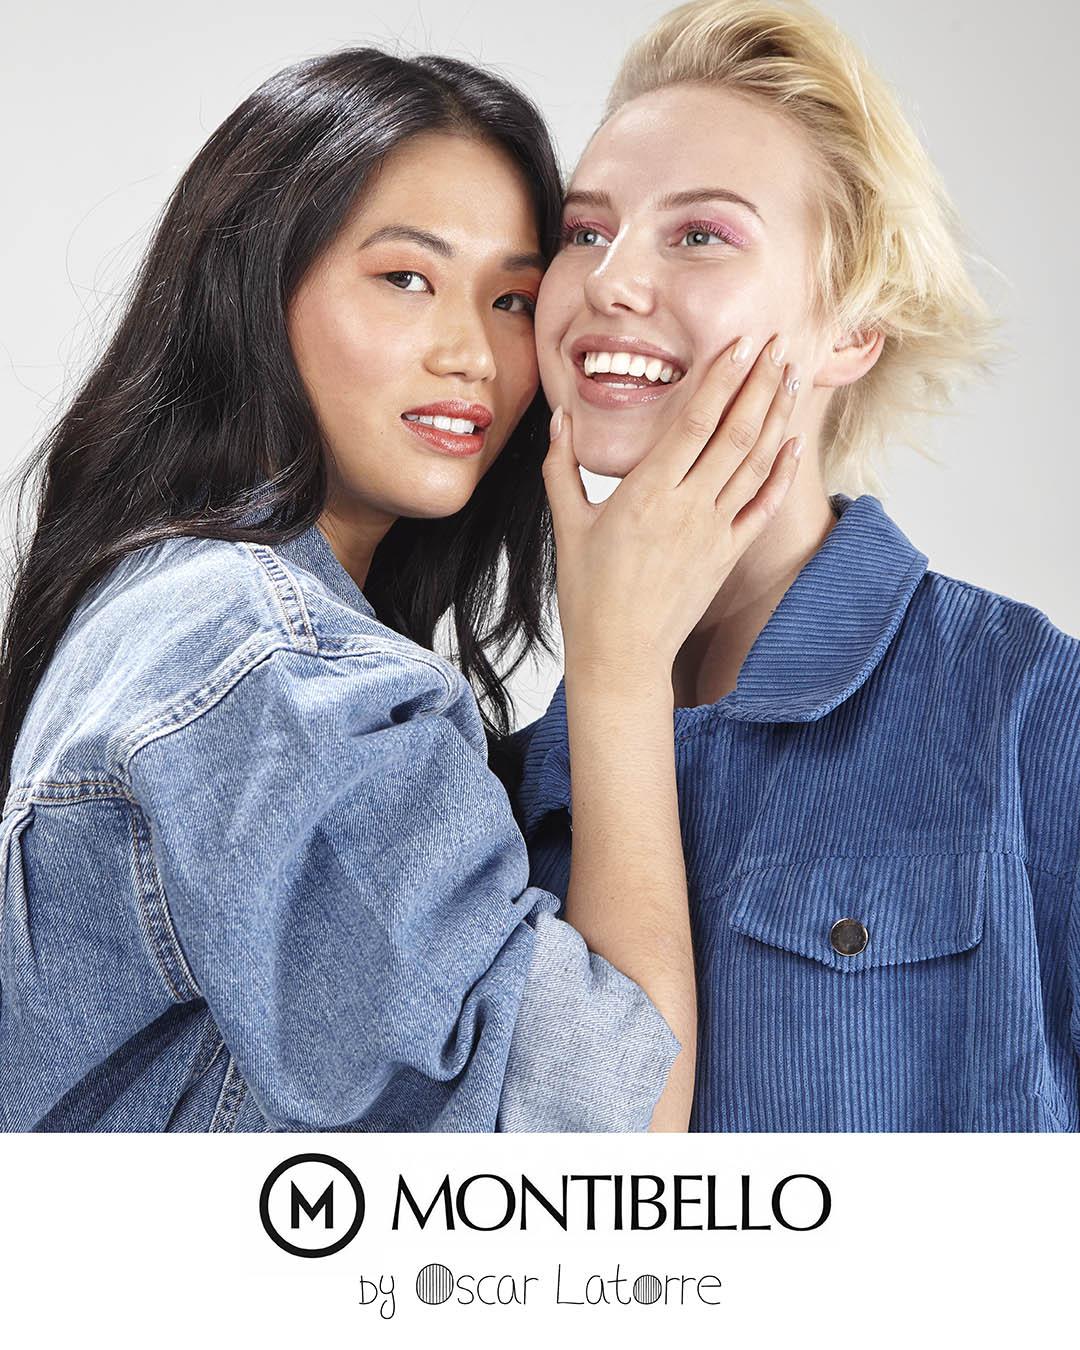 Montibello by Oscar Latorre